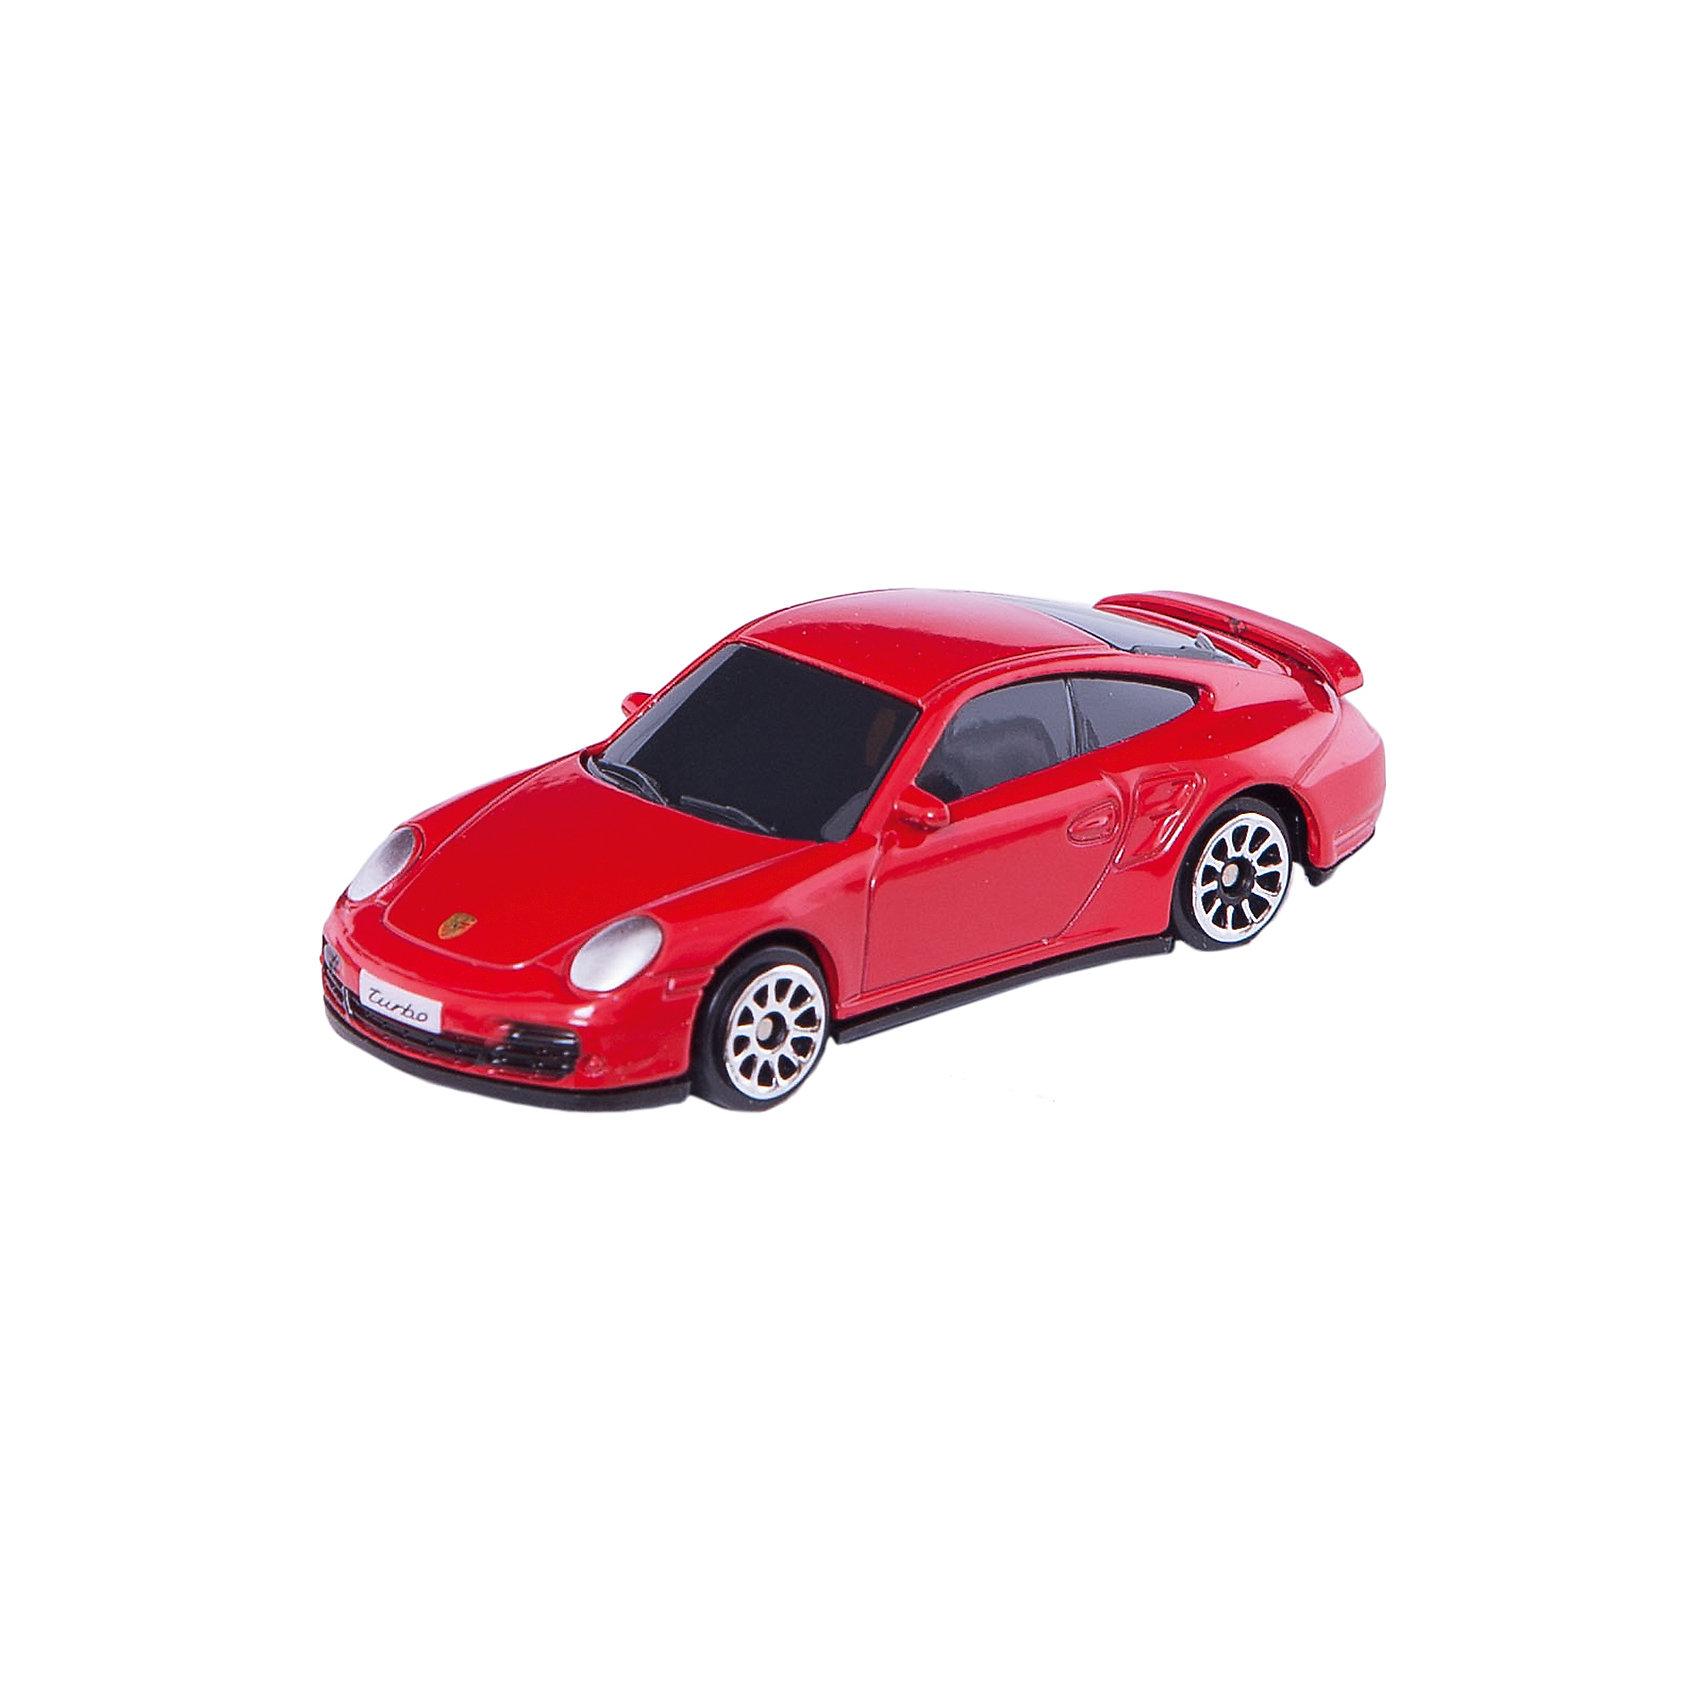 Машинка Porsche 911 TURBO (997) Jeans 3, AutotimeМашинки<br><br><br>Ширина мм: 90<br>Глубина мм: 42<br>Высота мм: 40<br>Вес г: 14<br>Возраст от месяцев: 36<br>Возраст до месяцев: 2147483647<br>Пол: Мужской<br>Возраст: Детский<br>SKU: 5584070